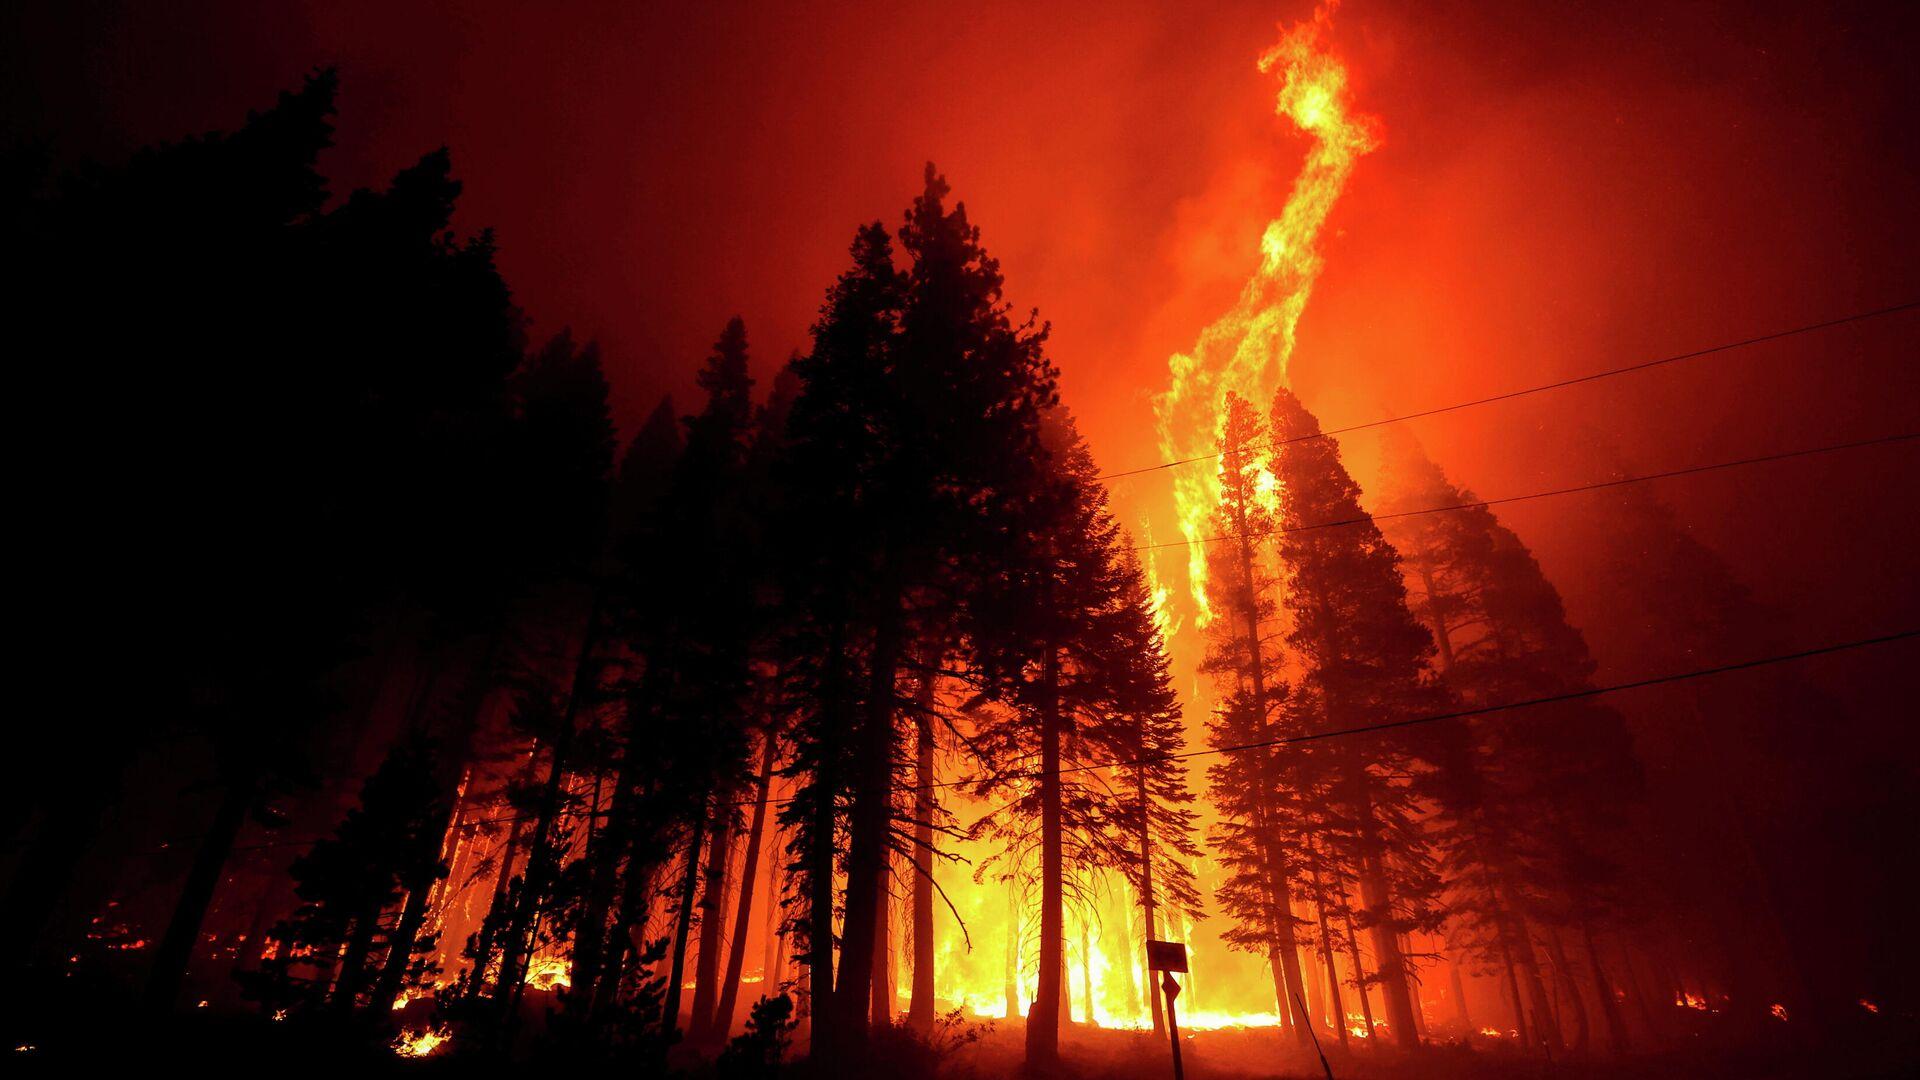 El incendio Caldor en California - Sputnik Mundo, 1920, 13.09.2021